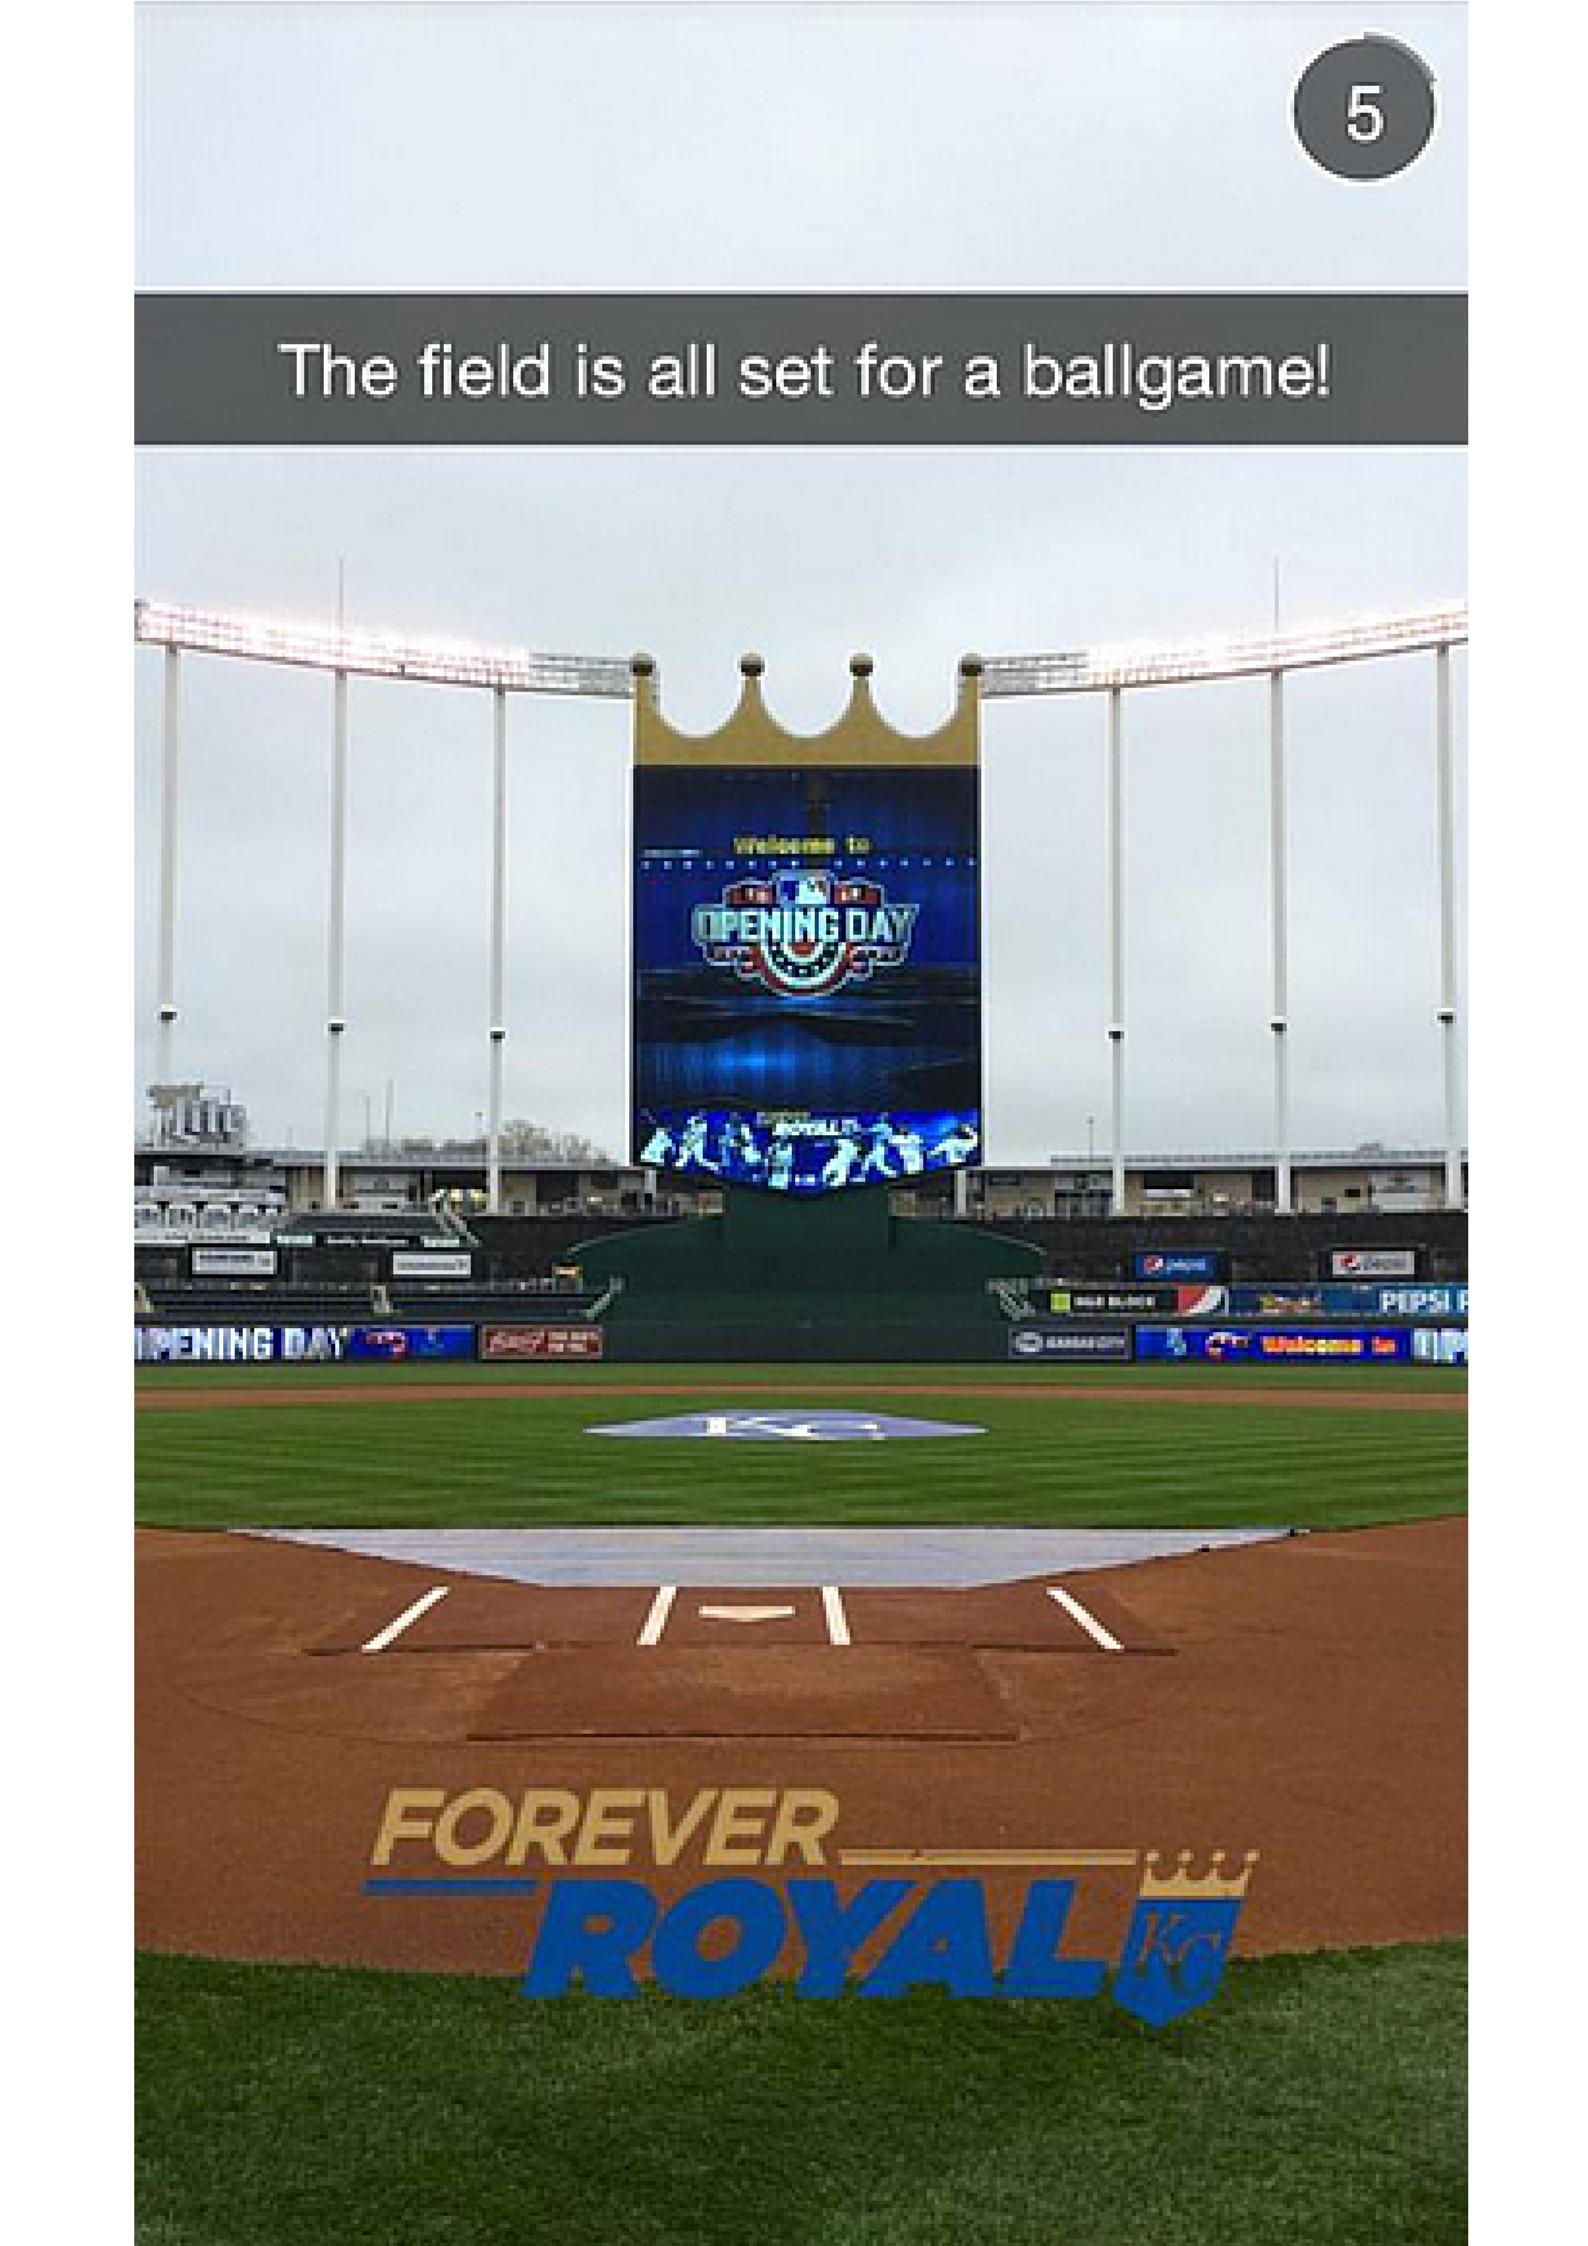 Royals_Filter